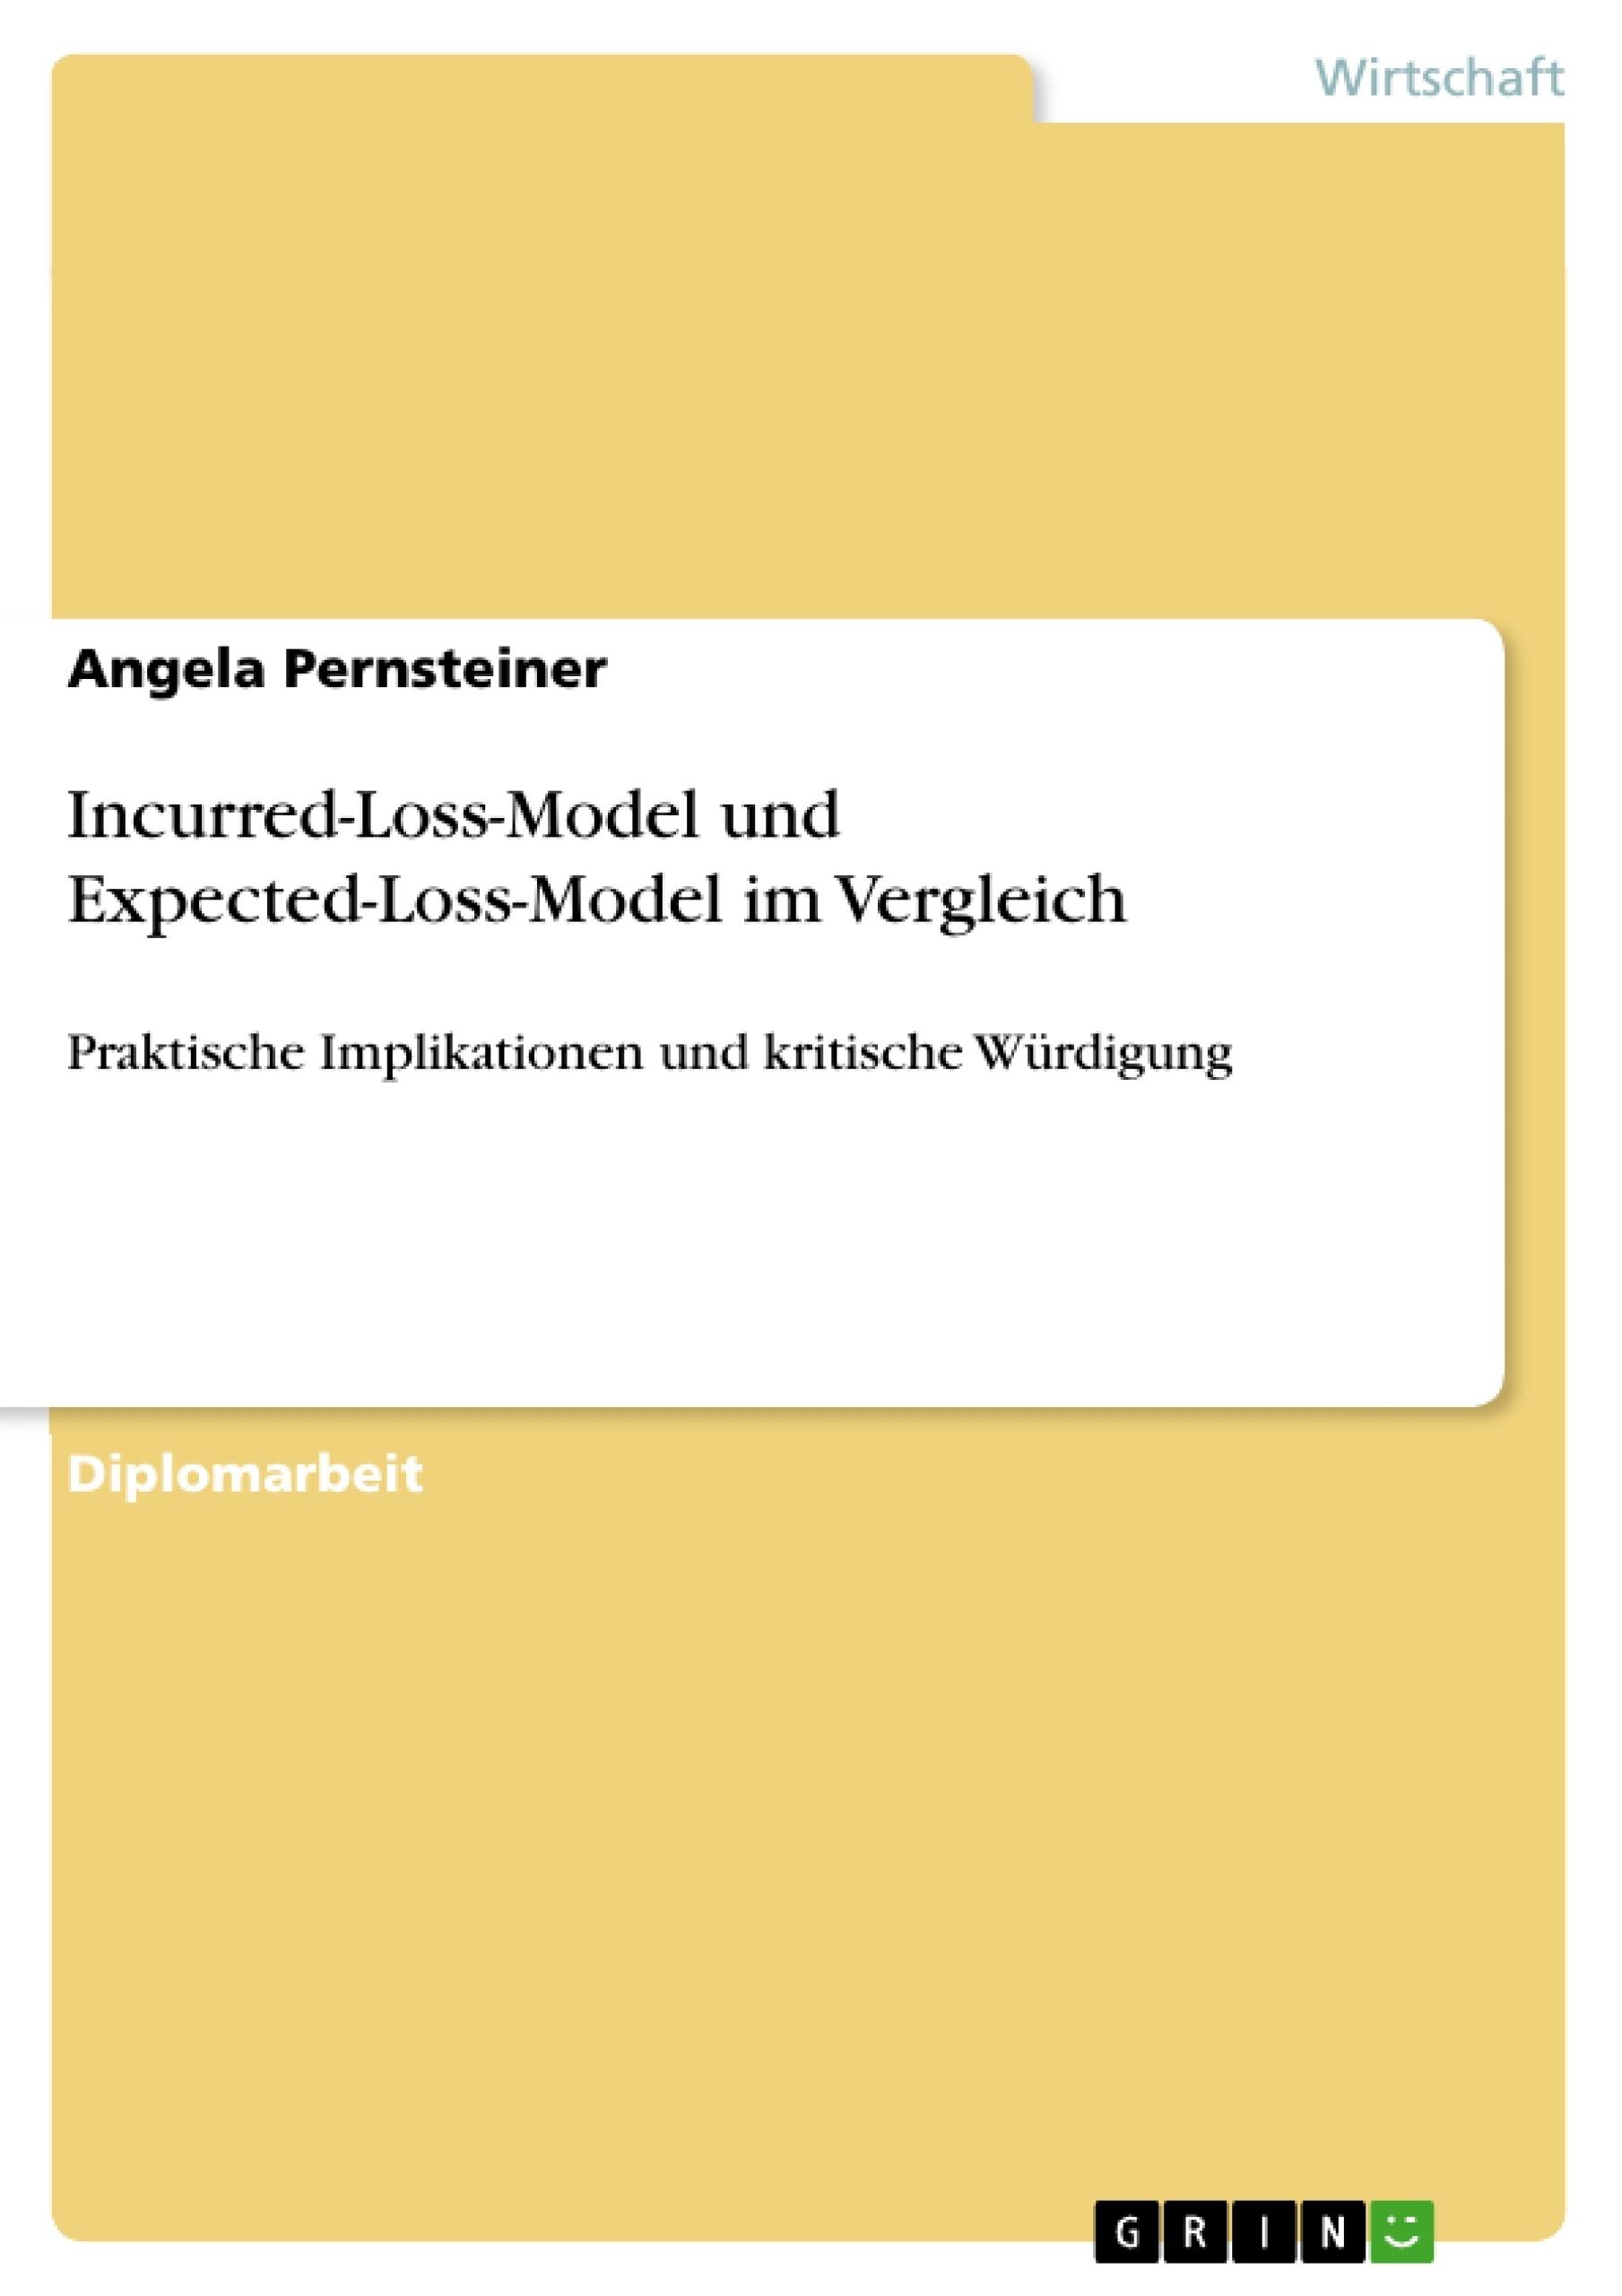 Titel: Incurred-Loss-Model und Expected-Loss-Model im Vergleich